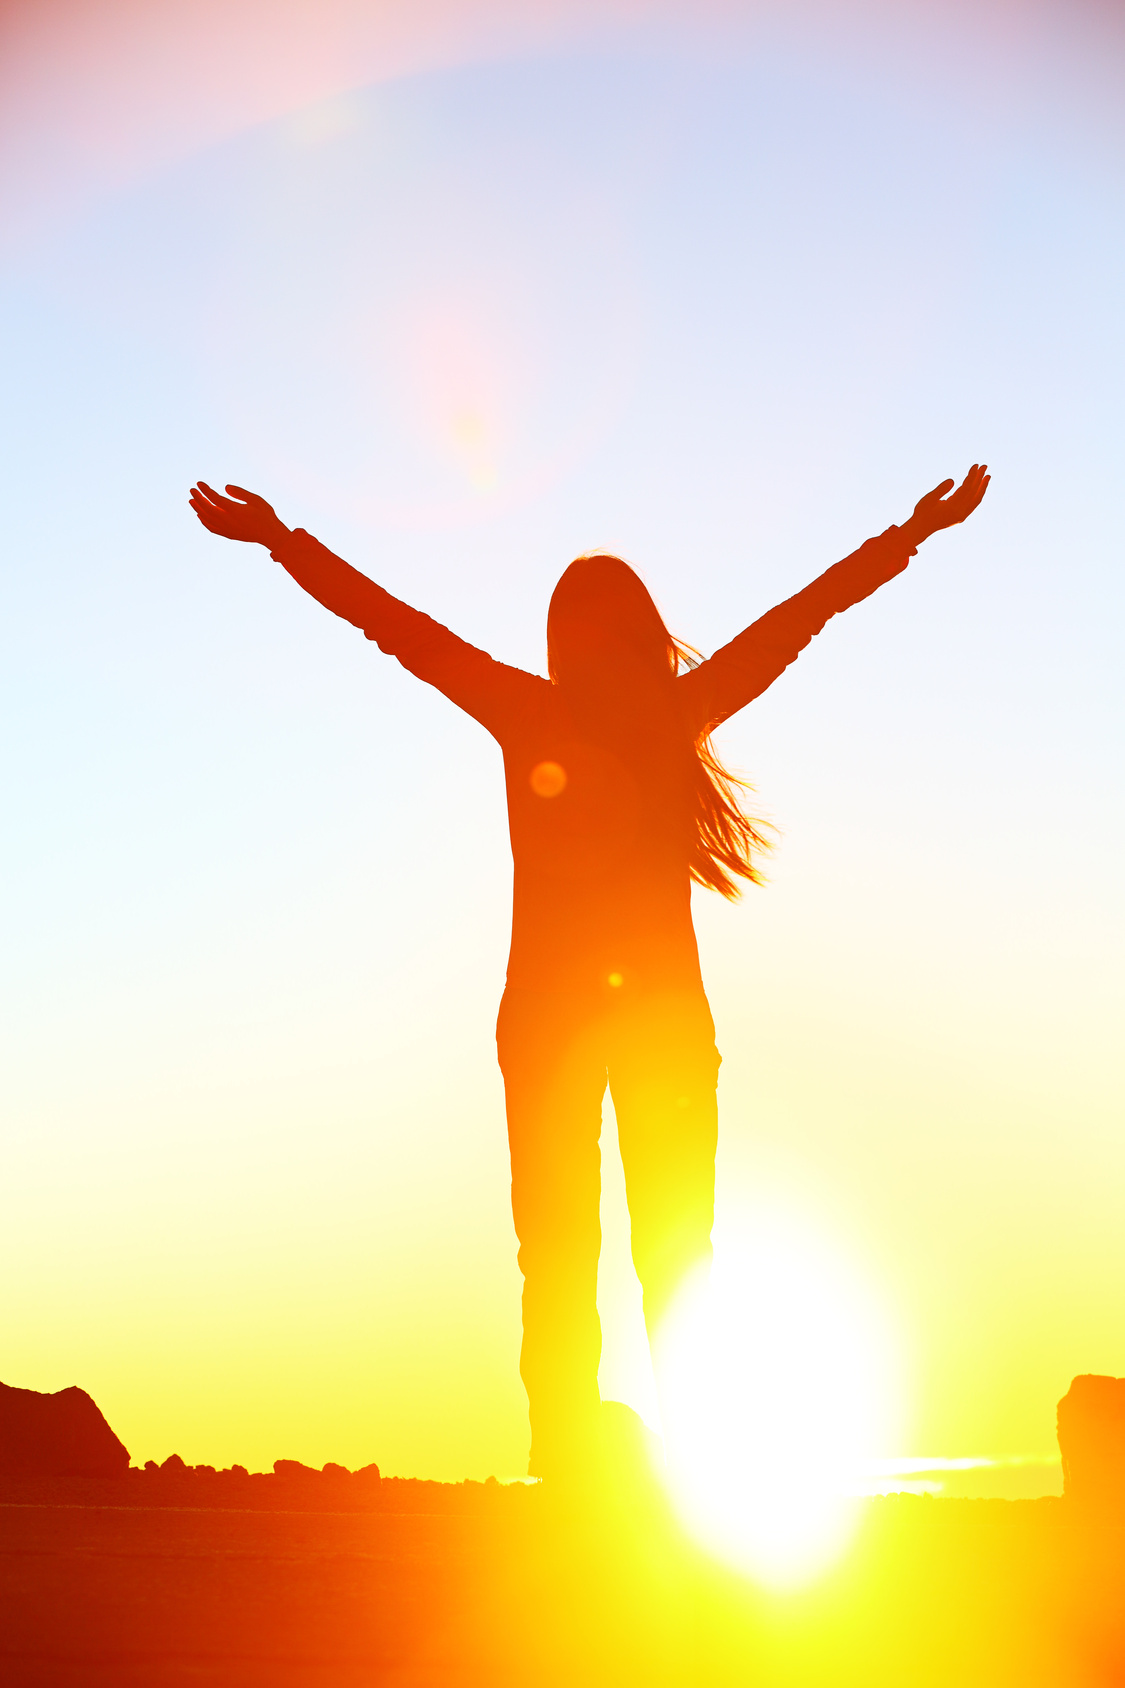 Happy cheering celebrating success woman sunset